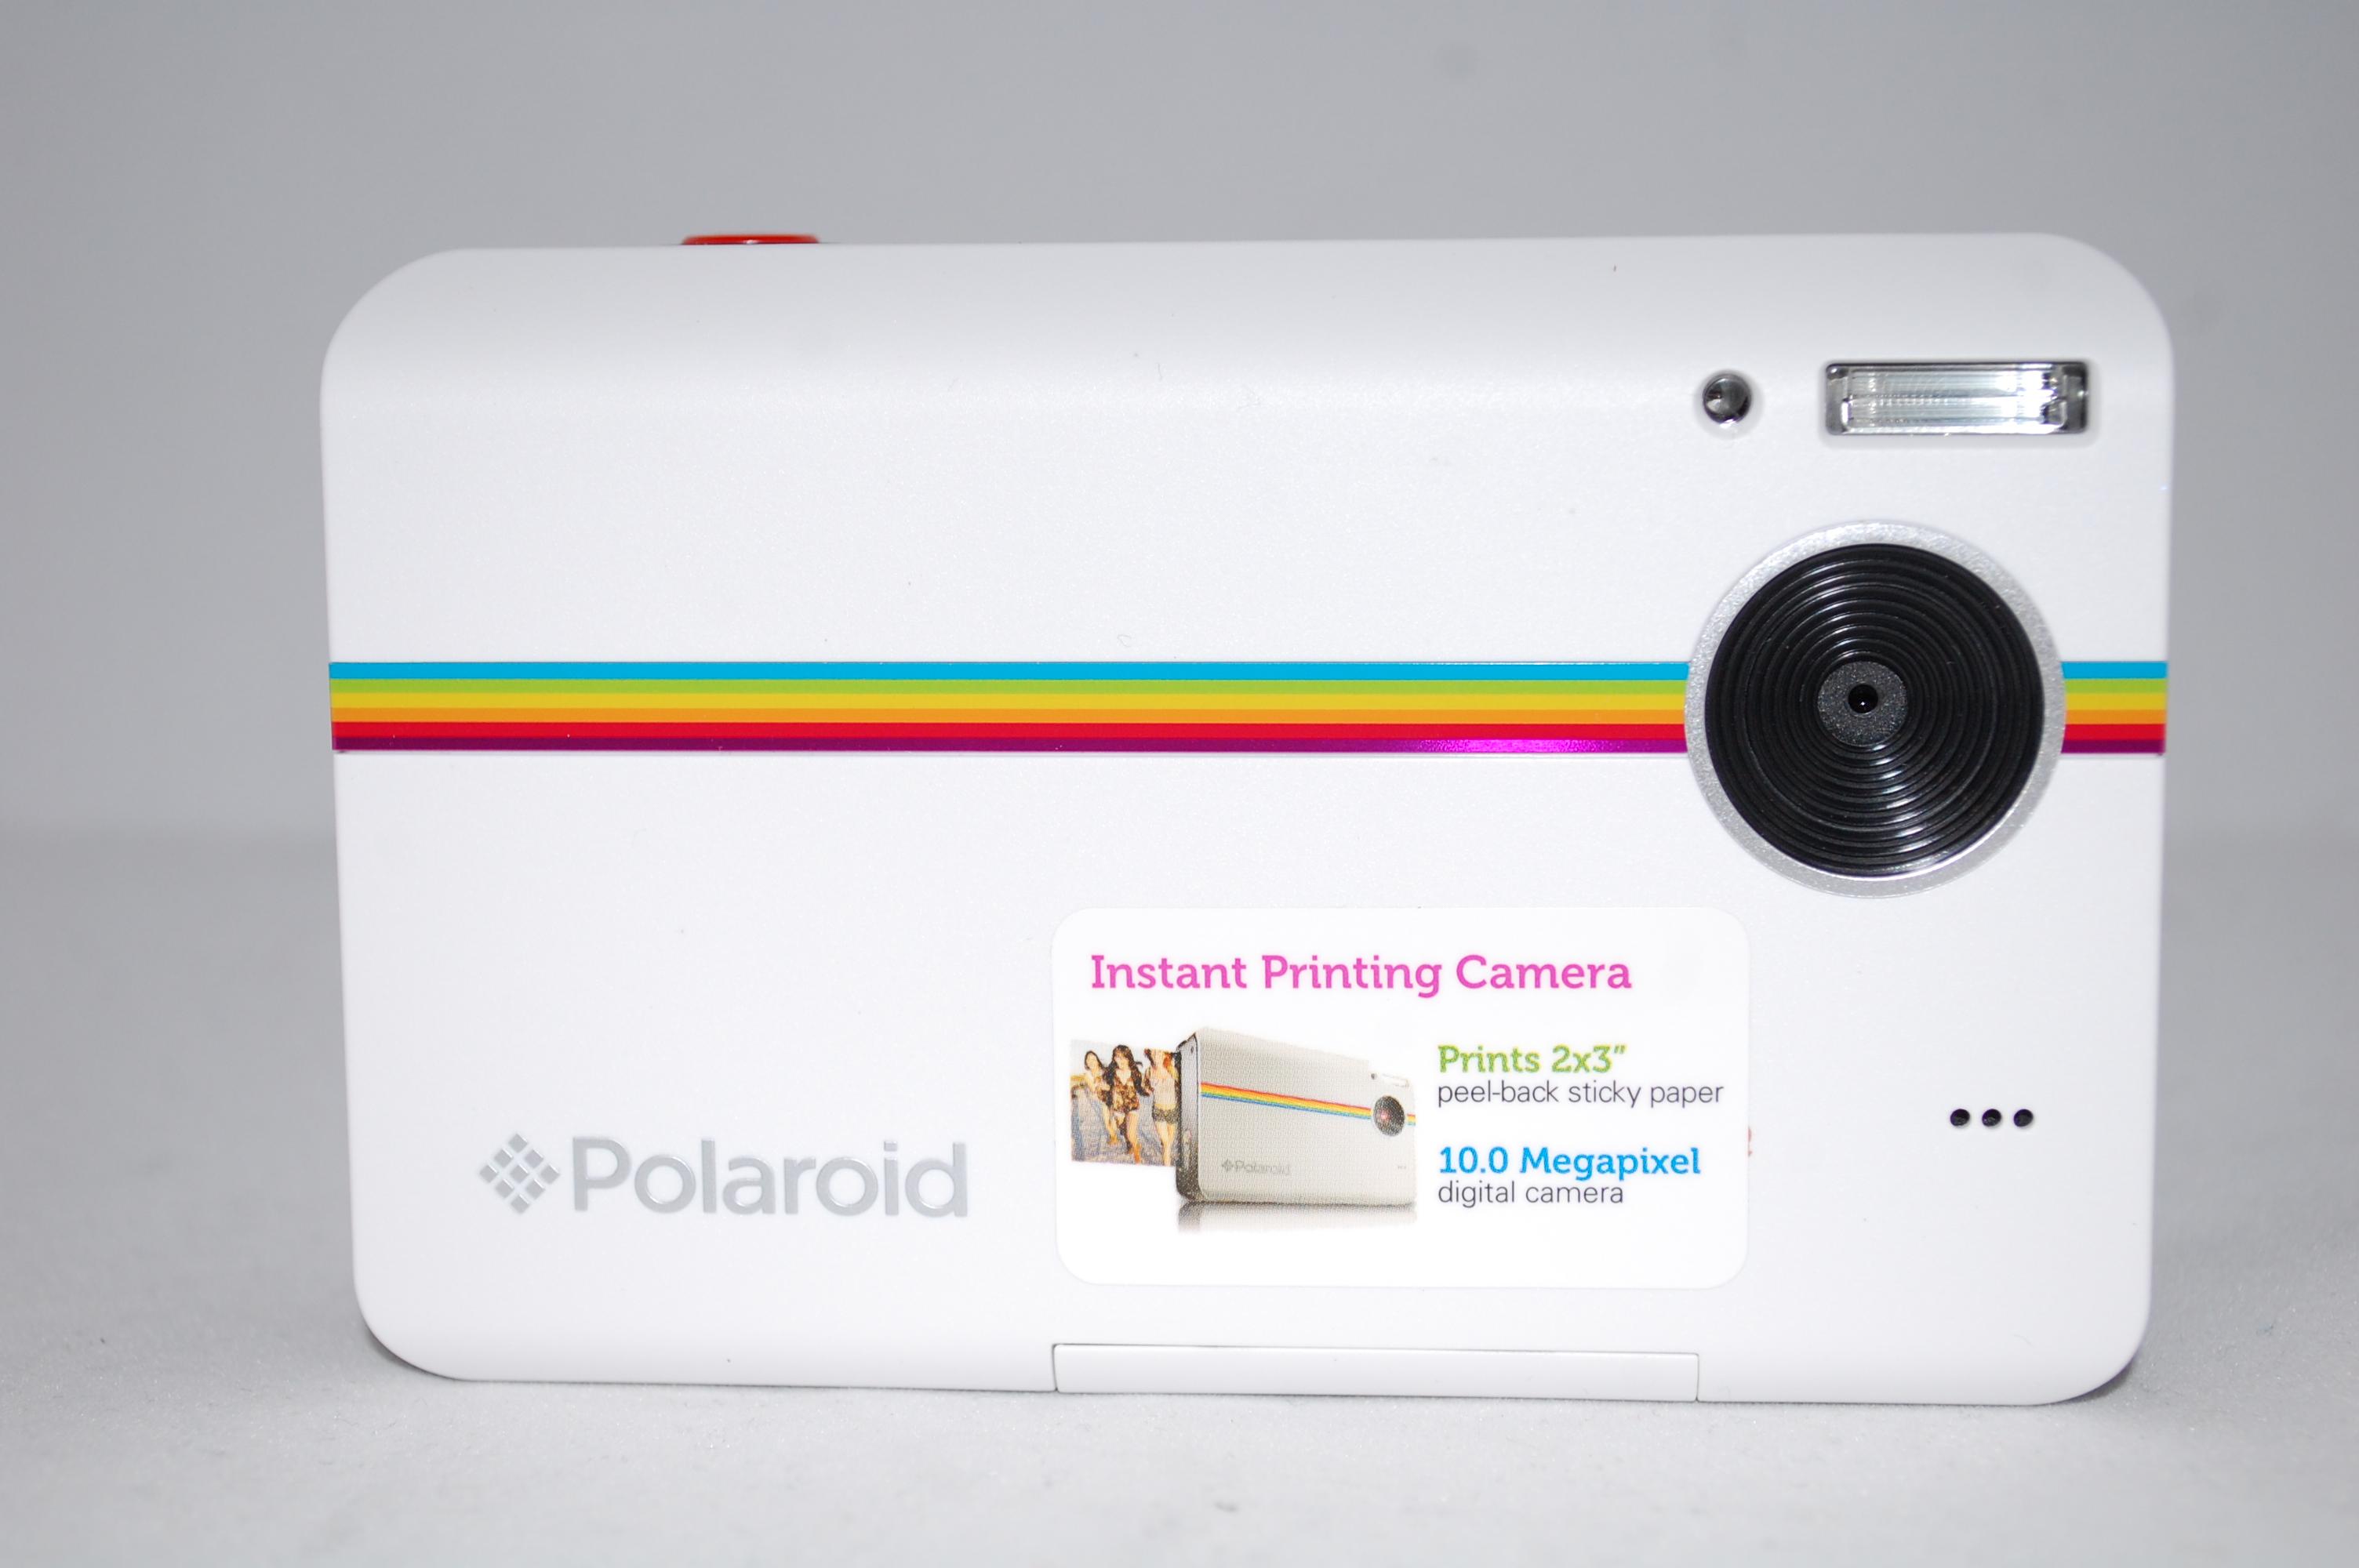 polaroid z2300 10mp digital instant print camera white ebay. Black Bedroom Furniture Sets. Home Design Ideas